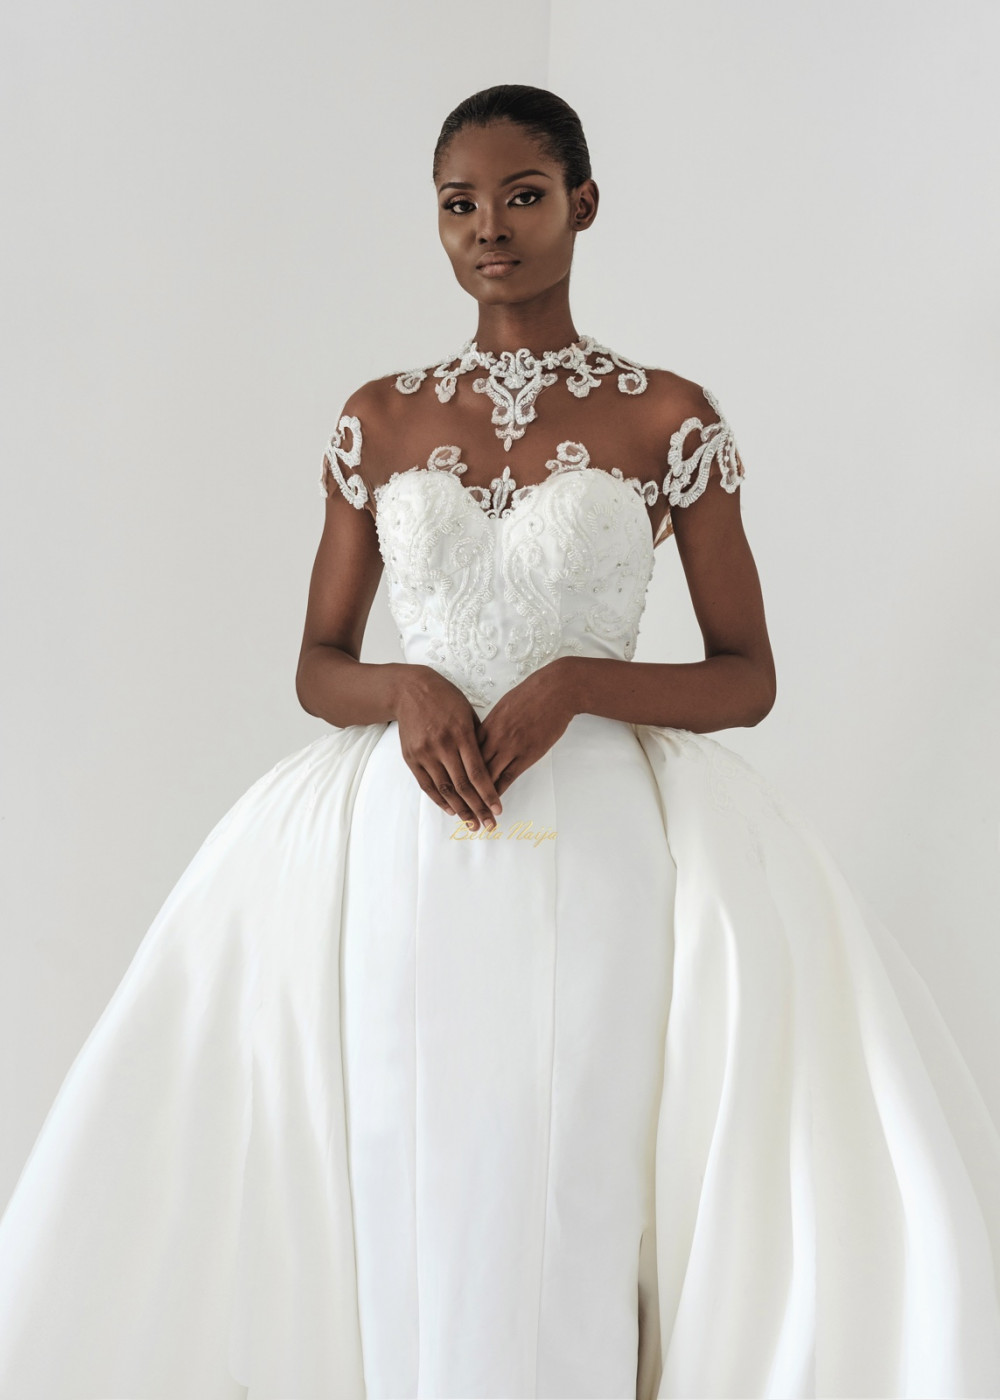 Wedding Dress Steamer 32 Fabulous The Andrea Iyamah bridal